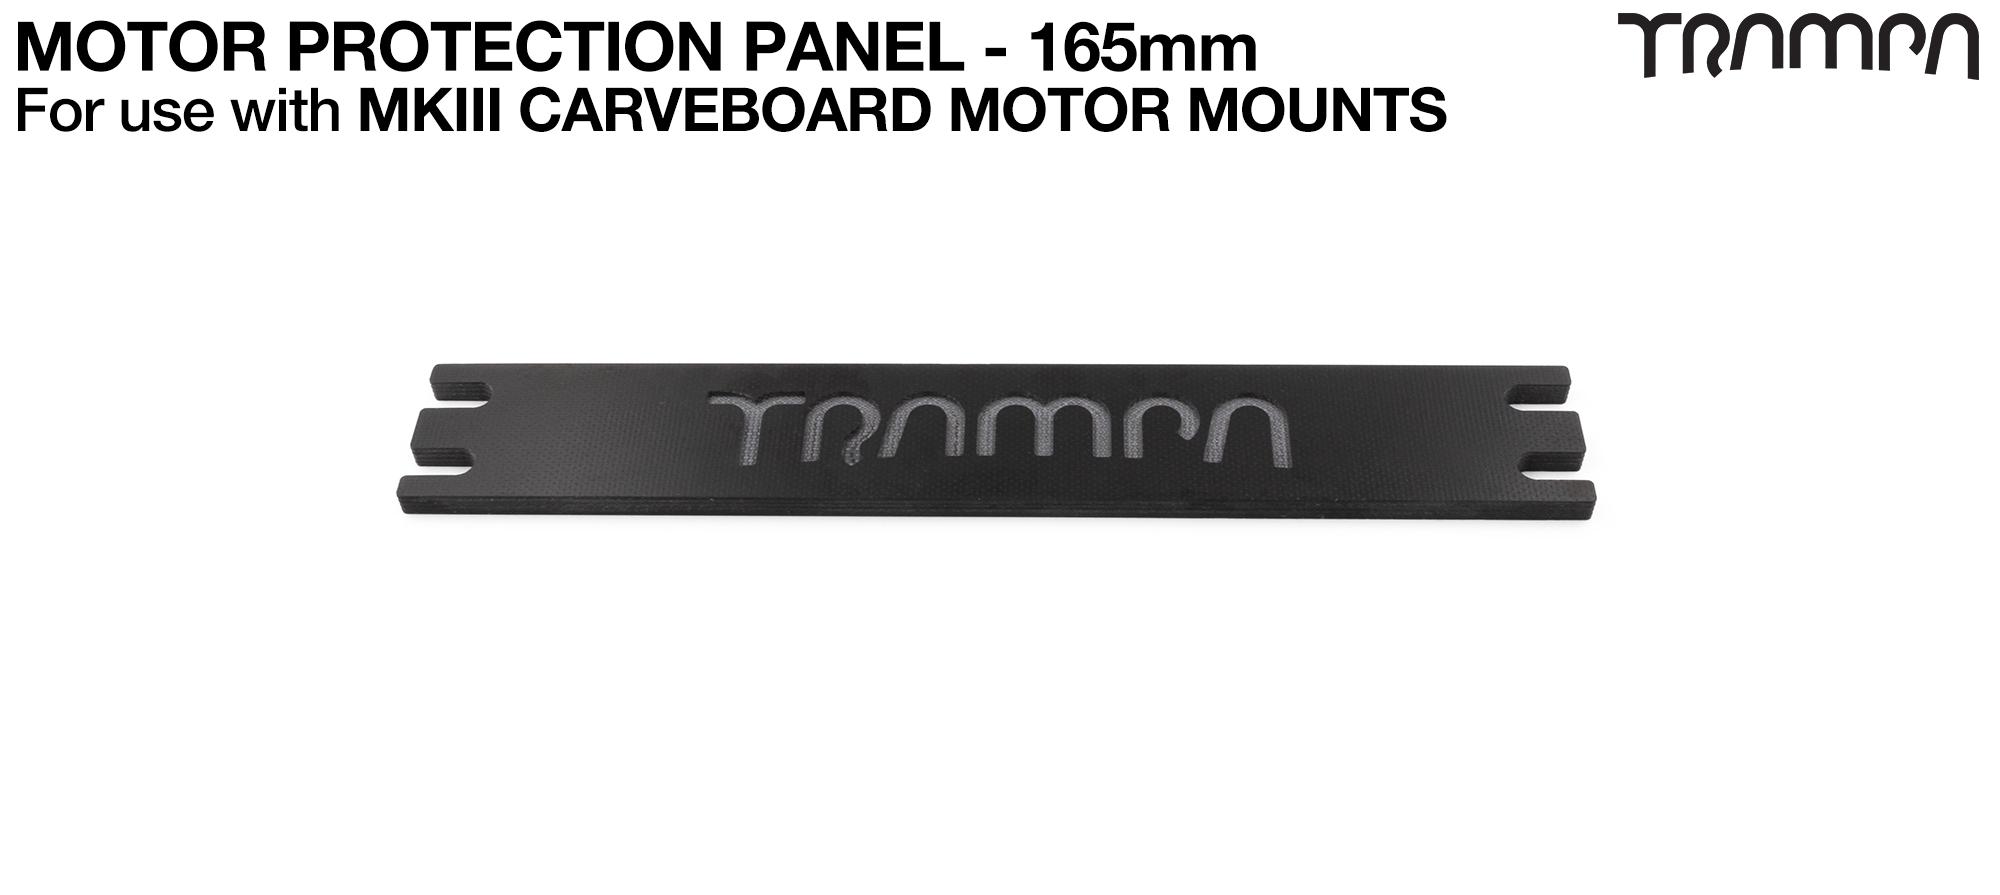 MkII URBAN & GUMMIES Carve Motor Mount Carbon Fibre Motor protection Panel